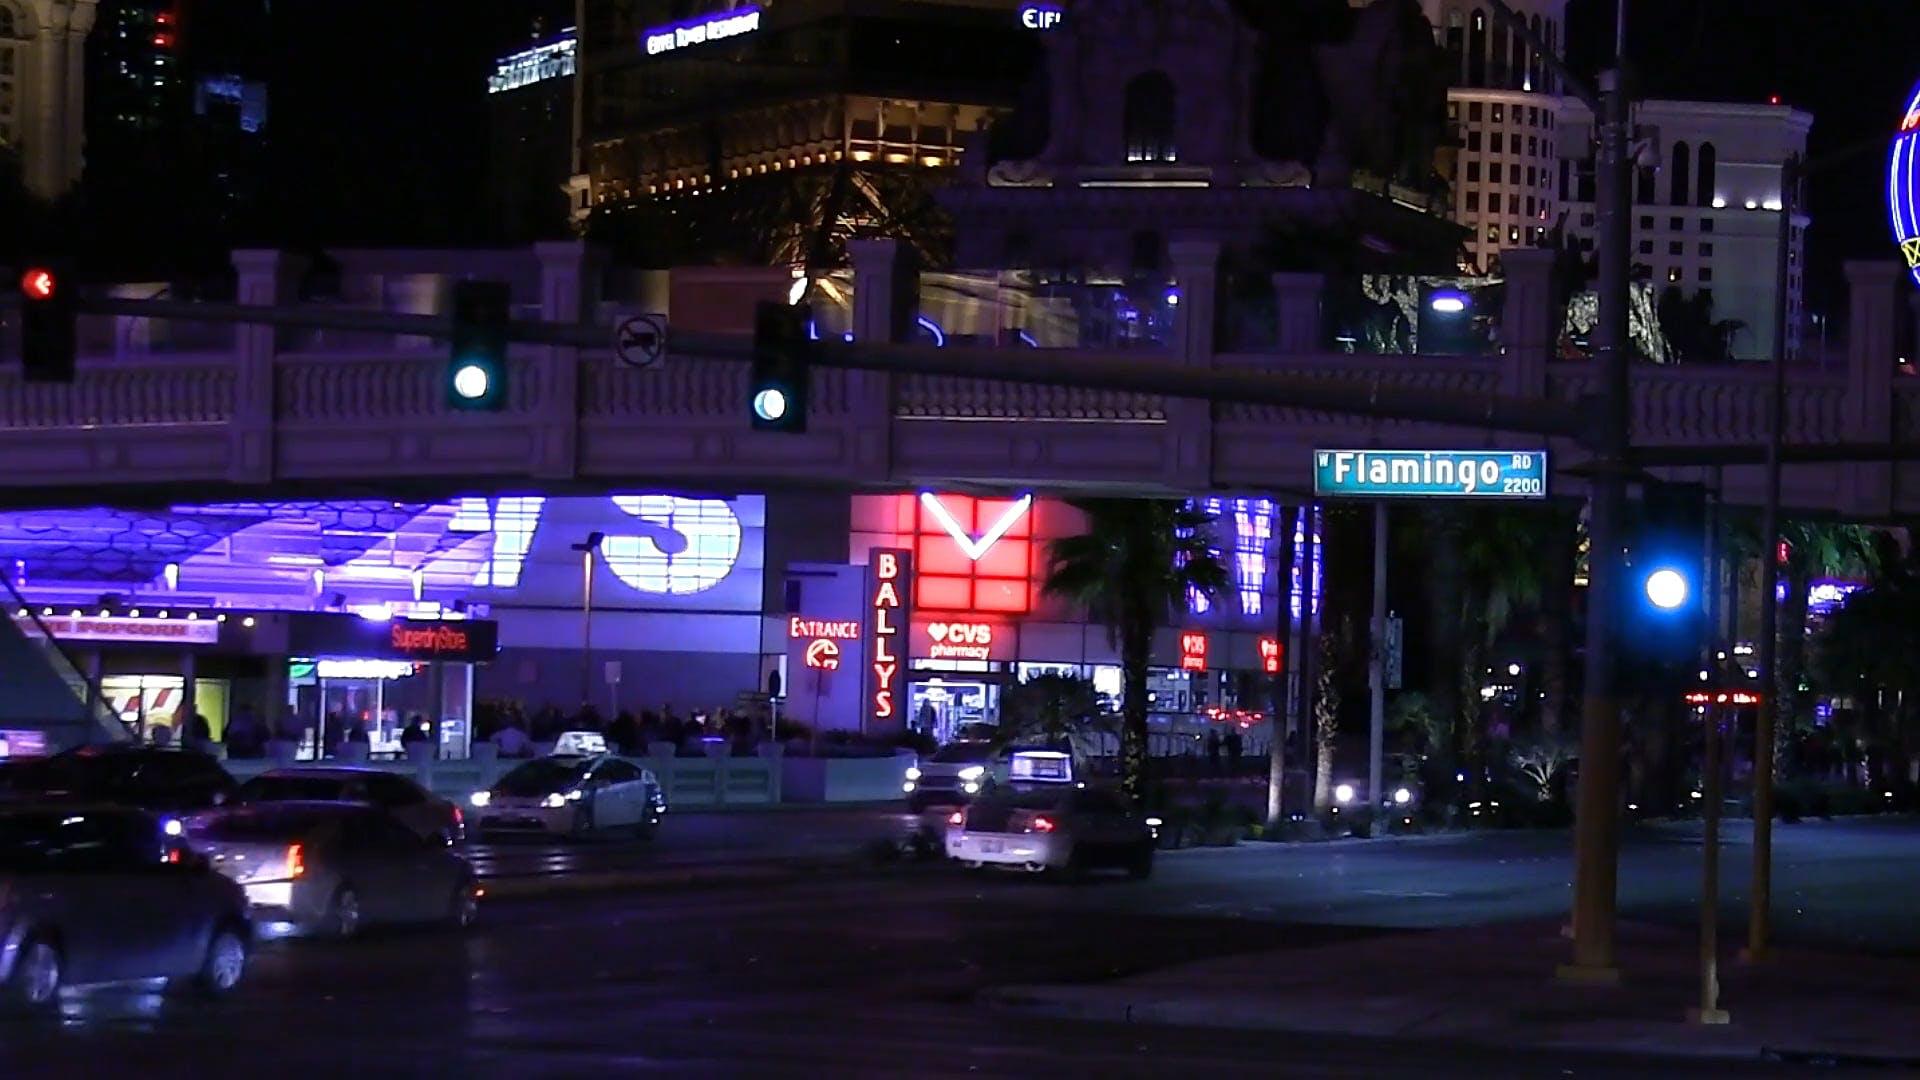 Video Of Traffic At Night